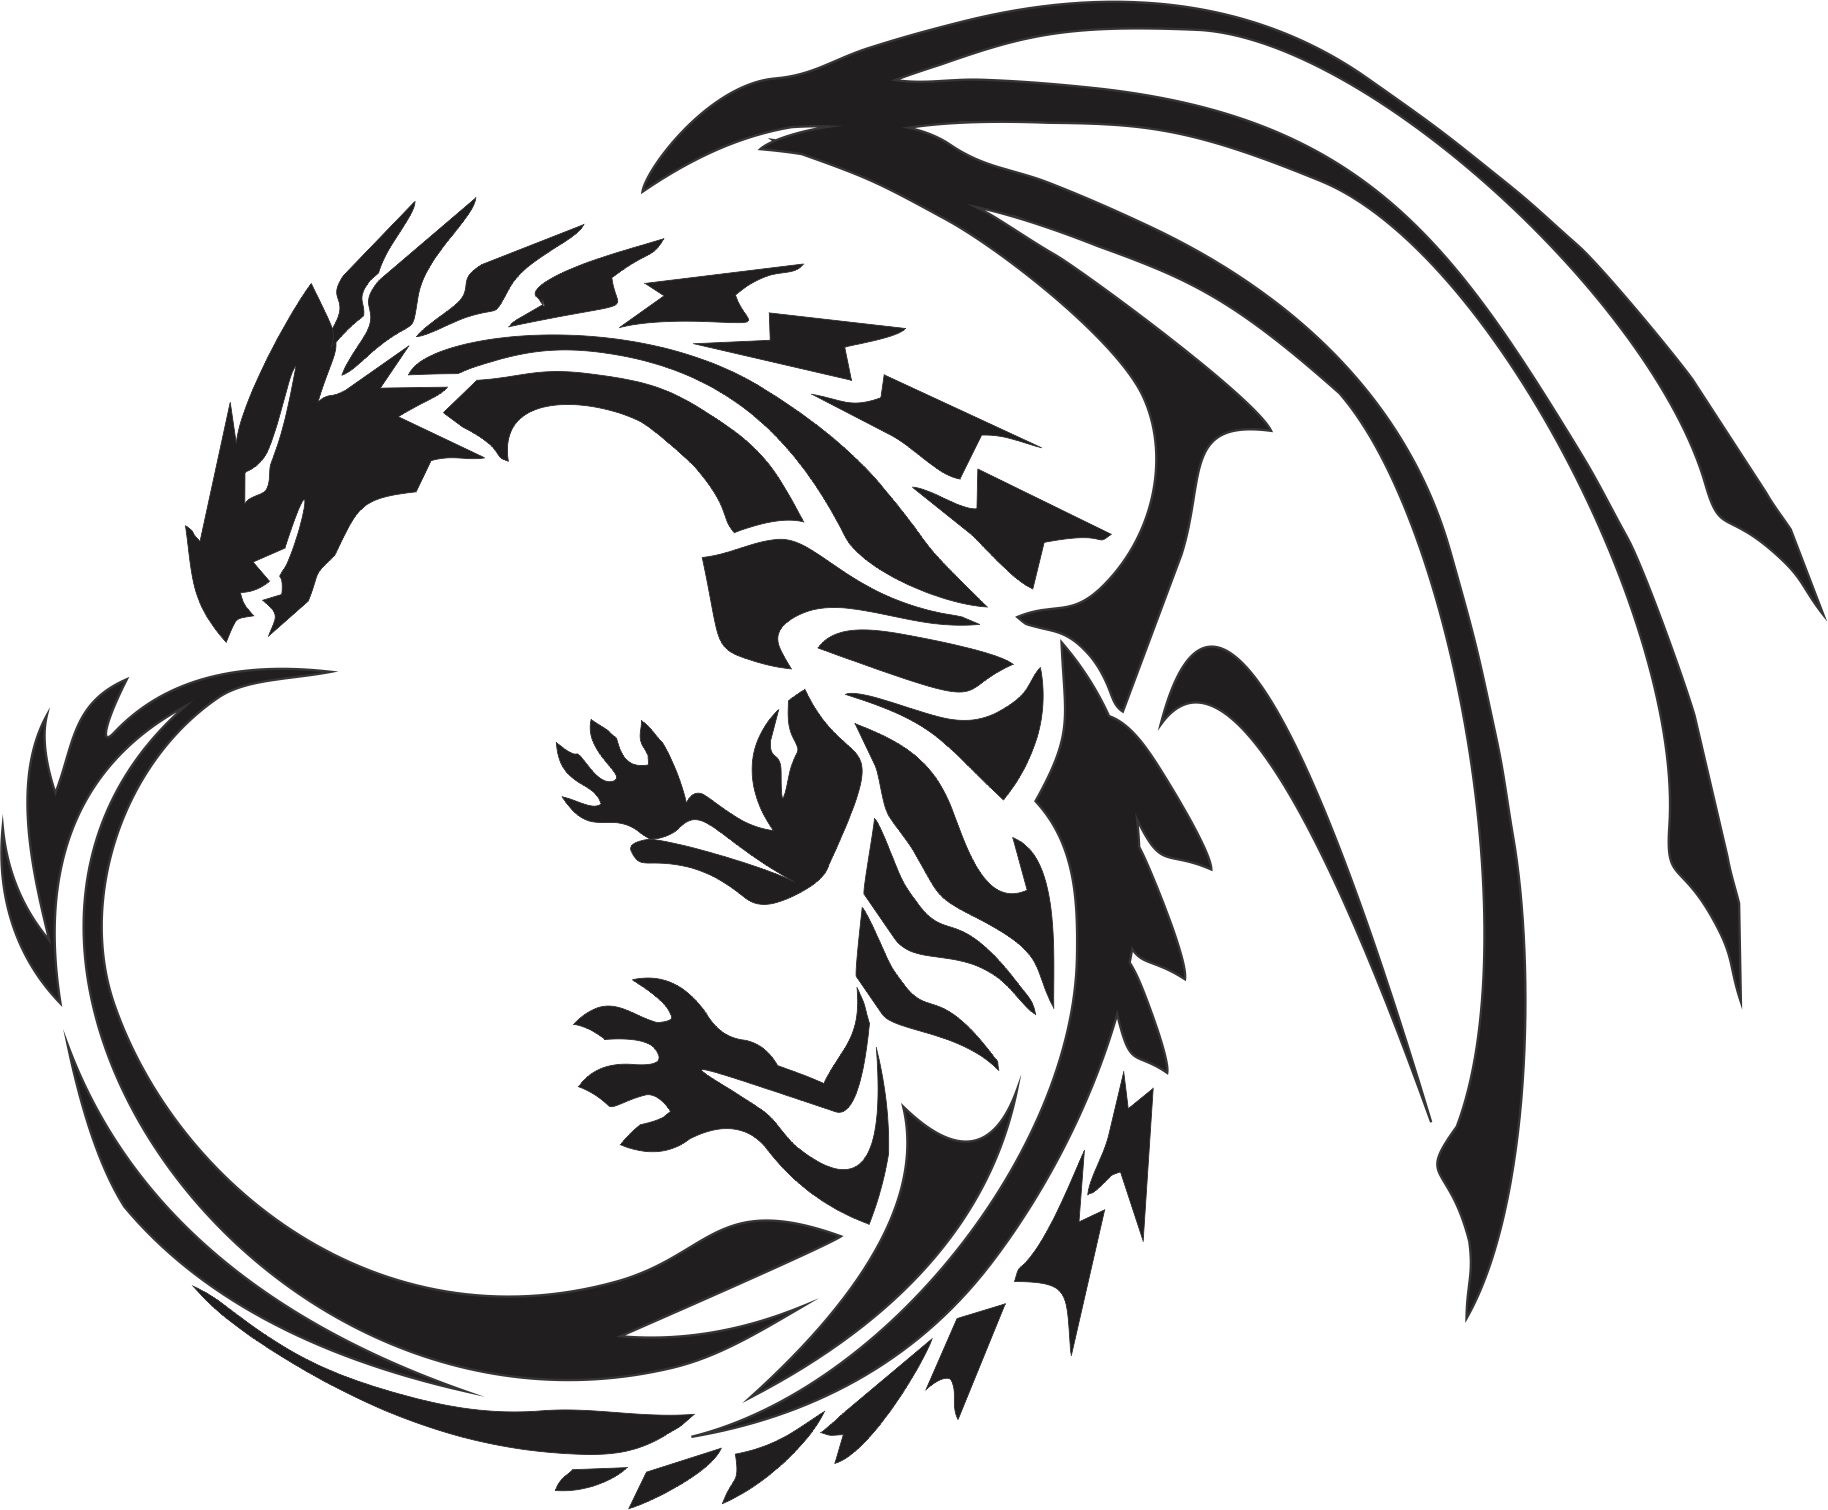 Dragon Circle Tattoo Design Photo 2 Tribal Dragon Tattoos Dragon Silhouette Dragon Tattoo